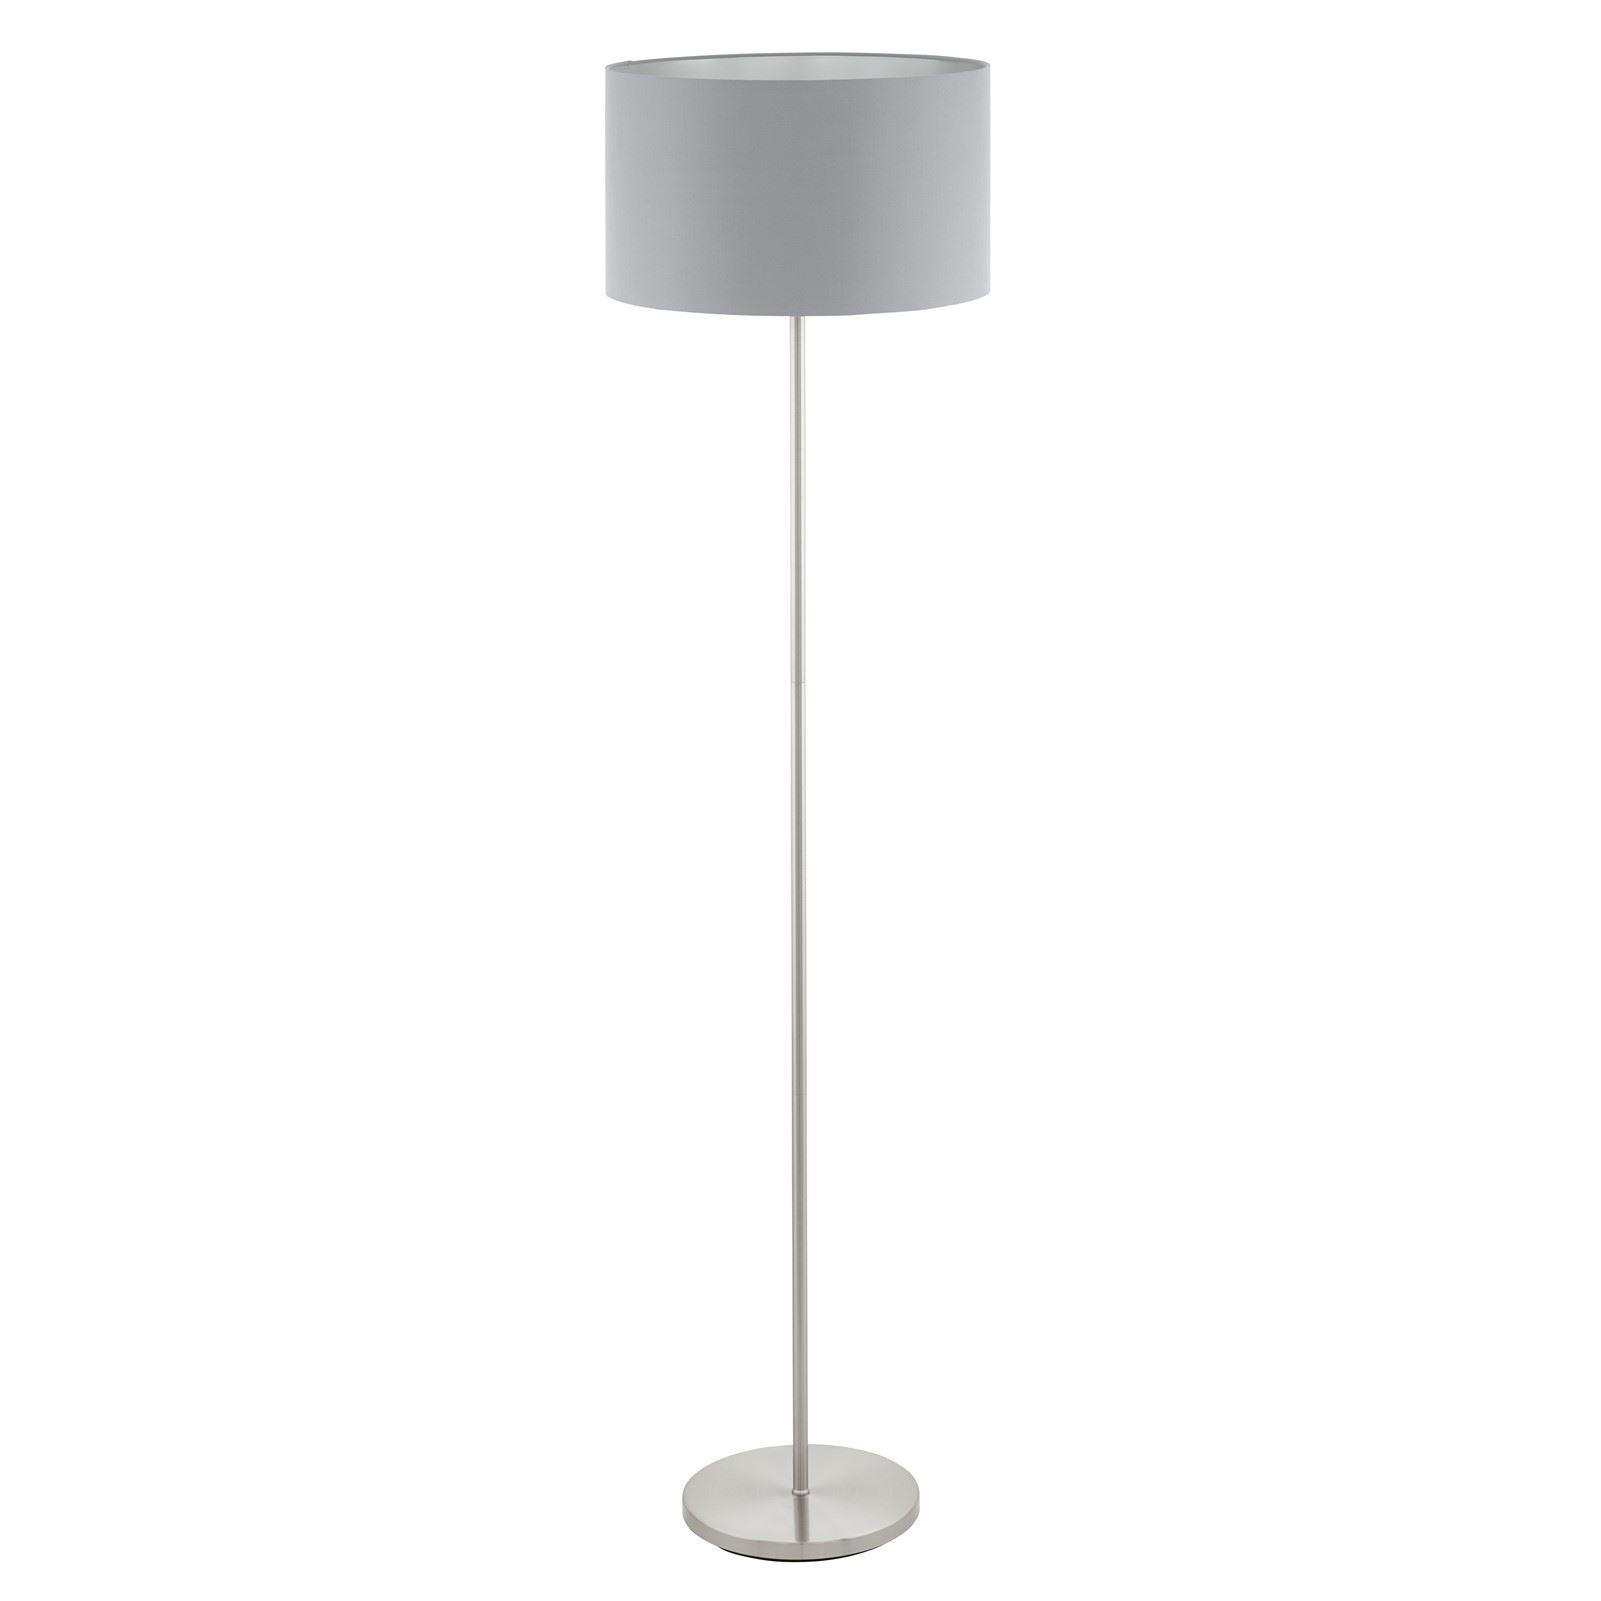 Maserlo Steel Satin Nickel Floor Lamp 1 Light With Grey-Silver Shade